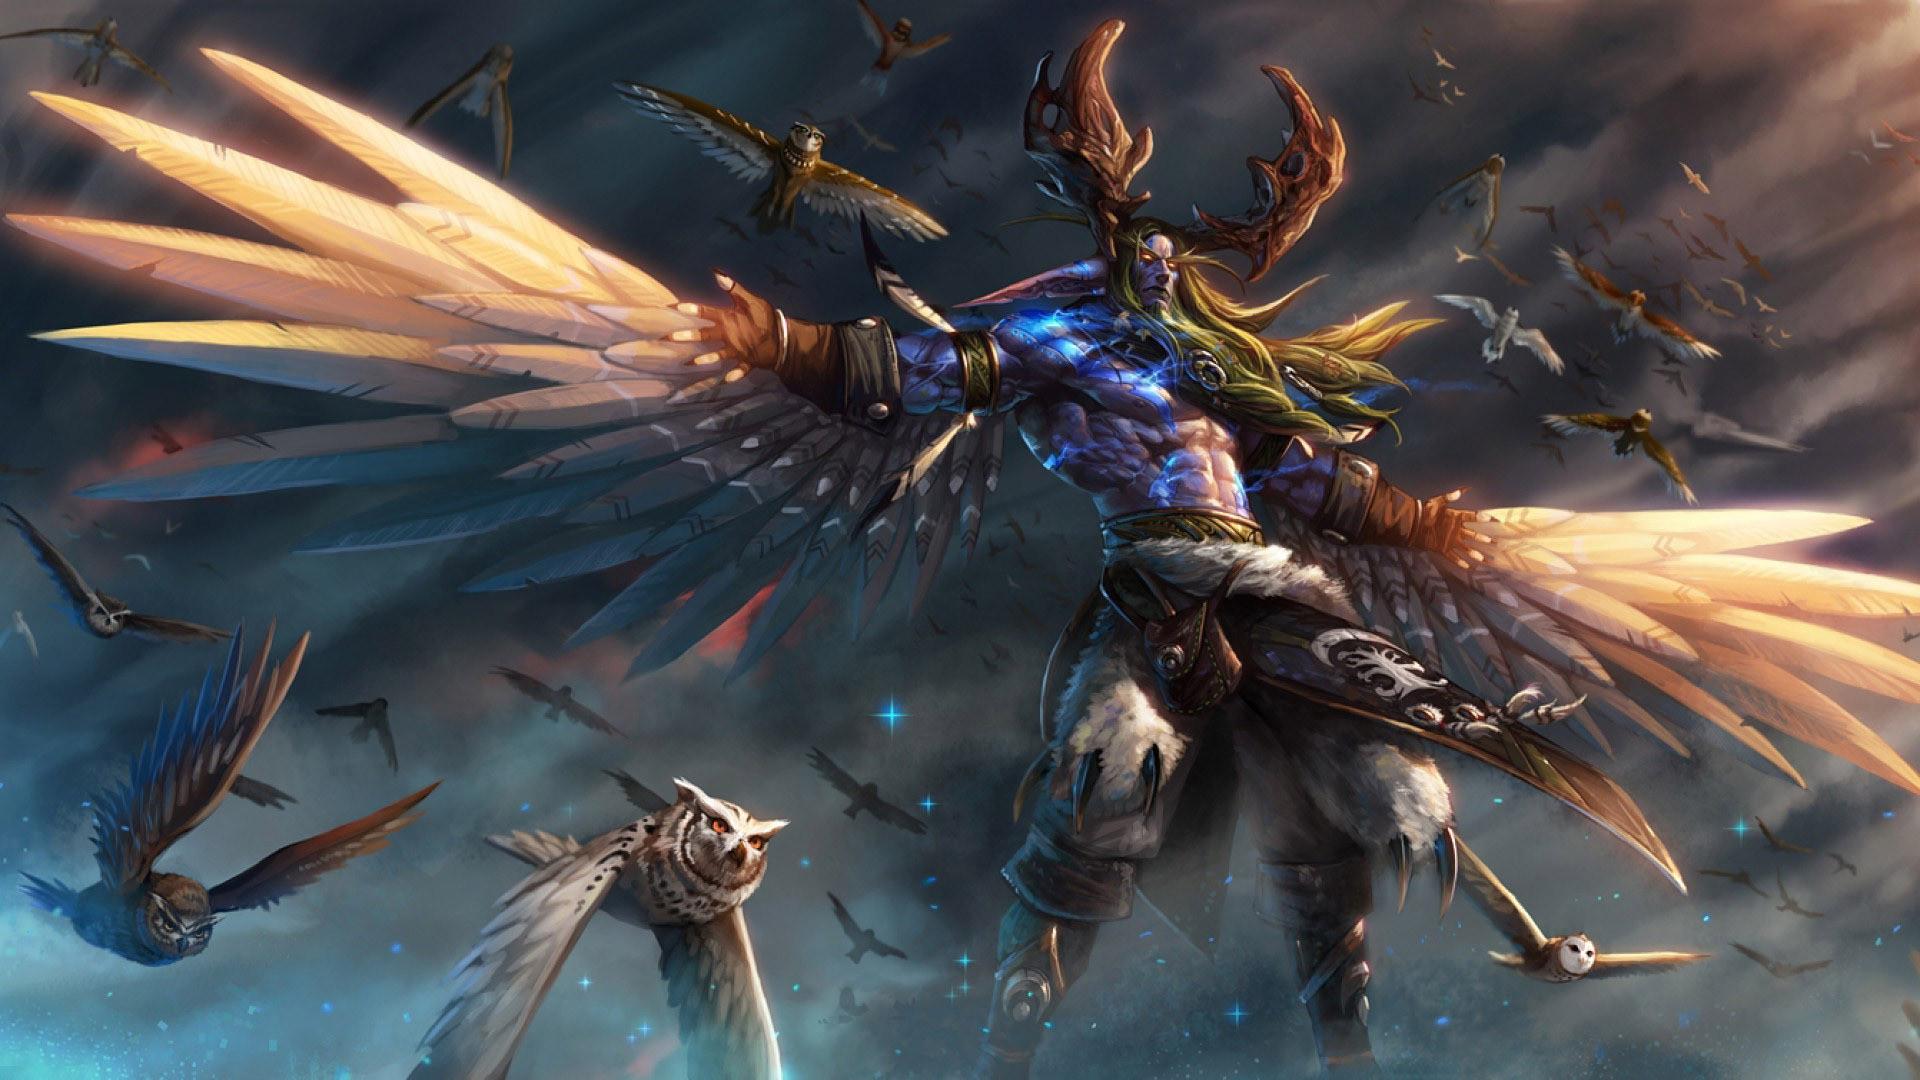 malfurion-stormrage-world-of-warcraft-game-hd-wallpaper-1920×1080-6739.jpg  (1920×1080) | Blizzard | Pinterest | Character ideas